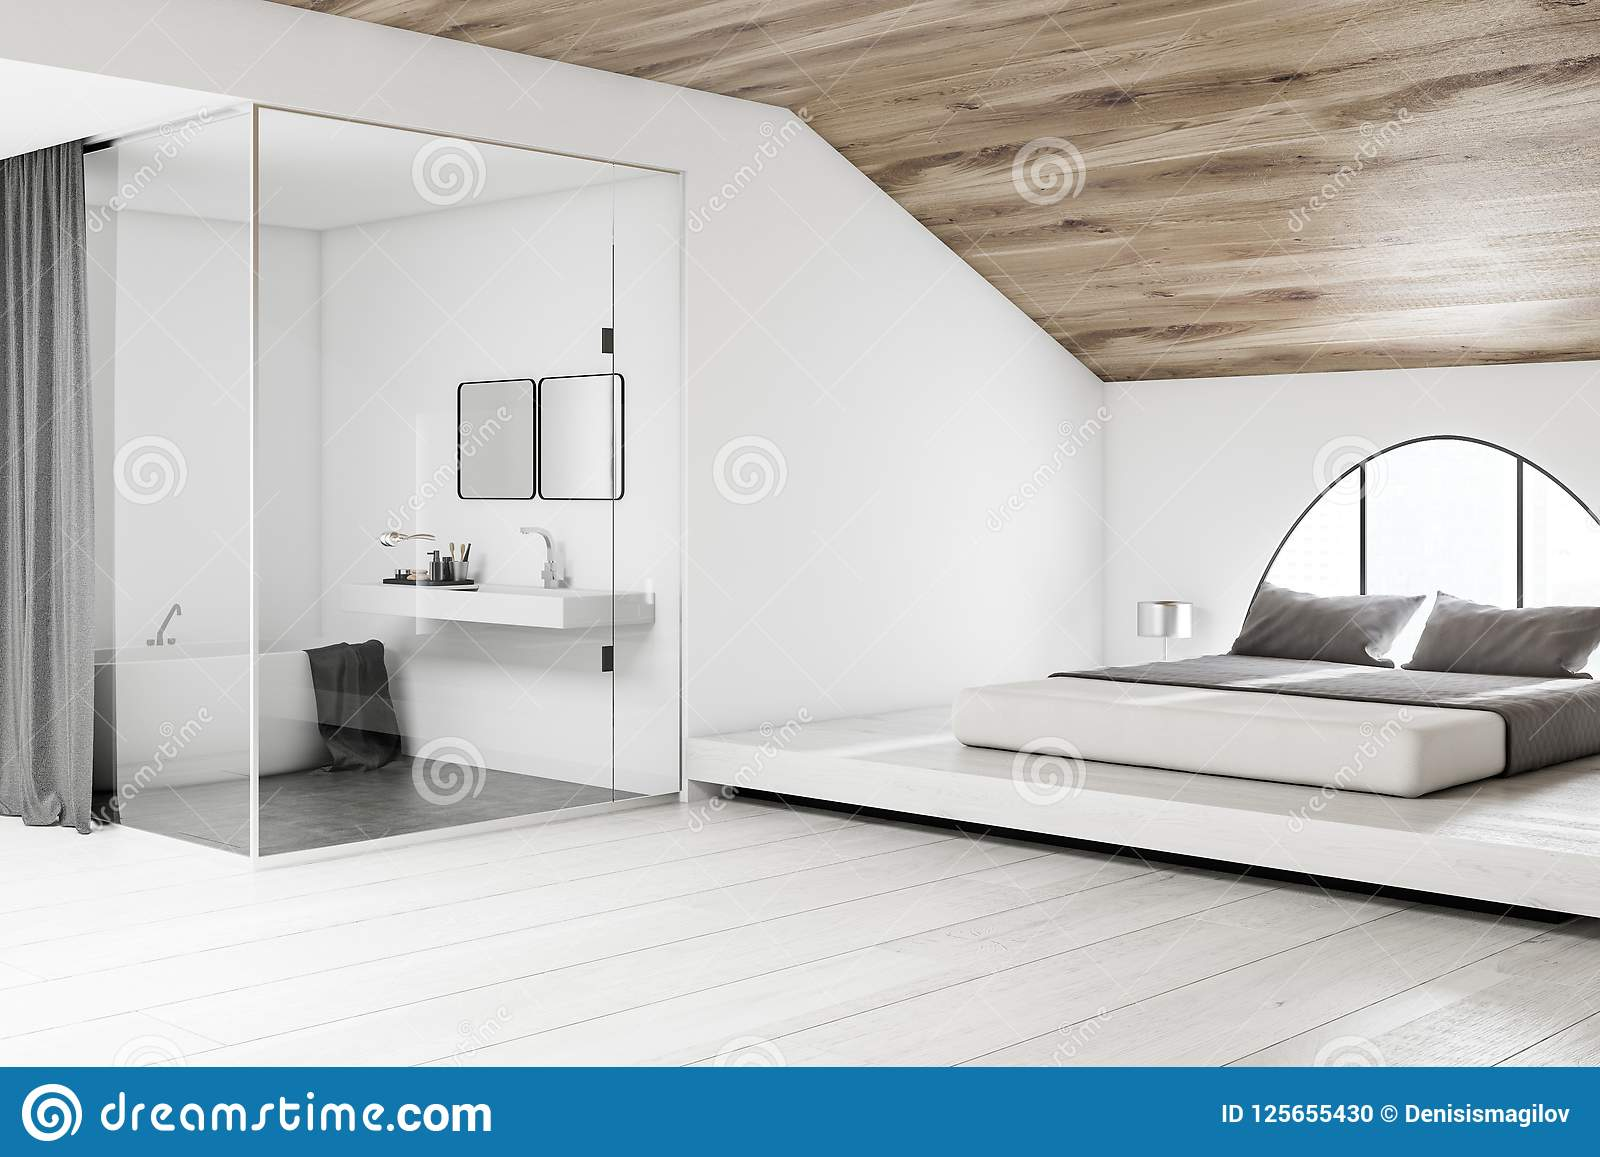 Soffitti In Legno Bianchi : Soffitti in legno bianco idee di image gallery ideedecorare me